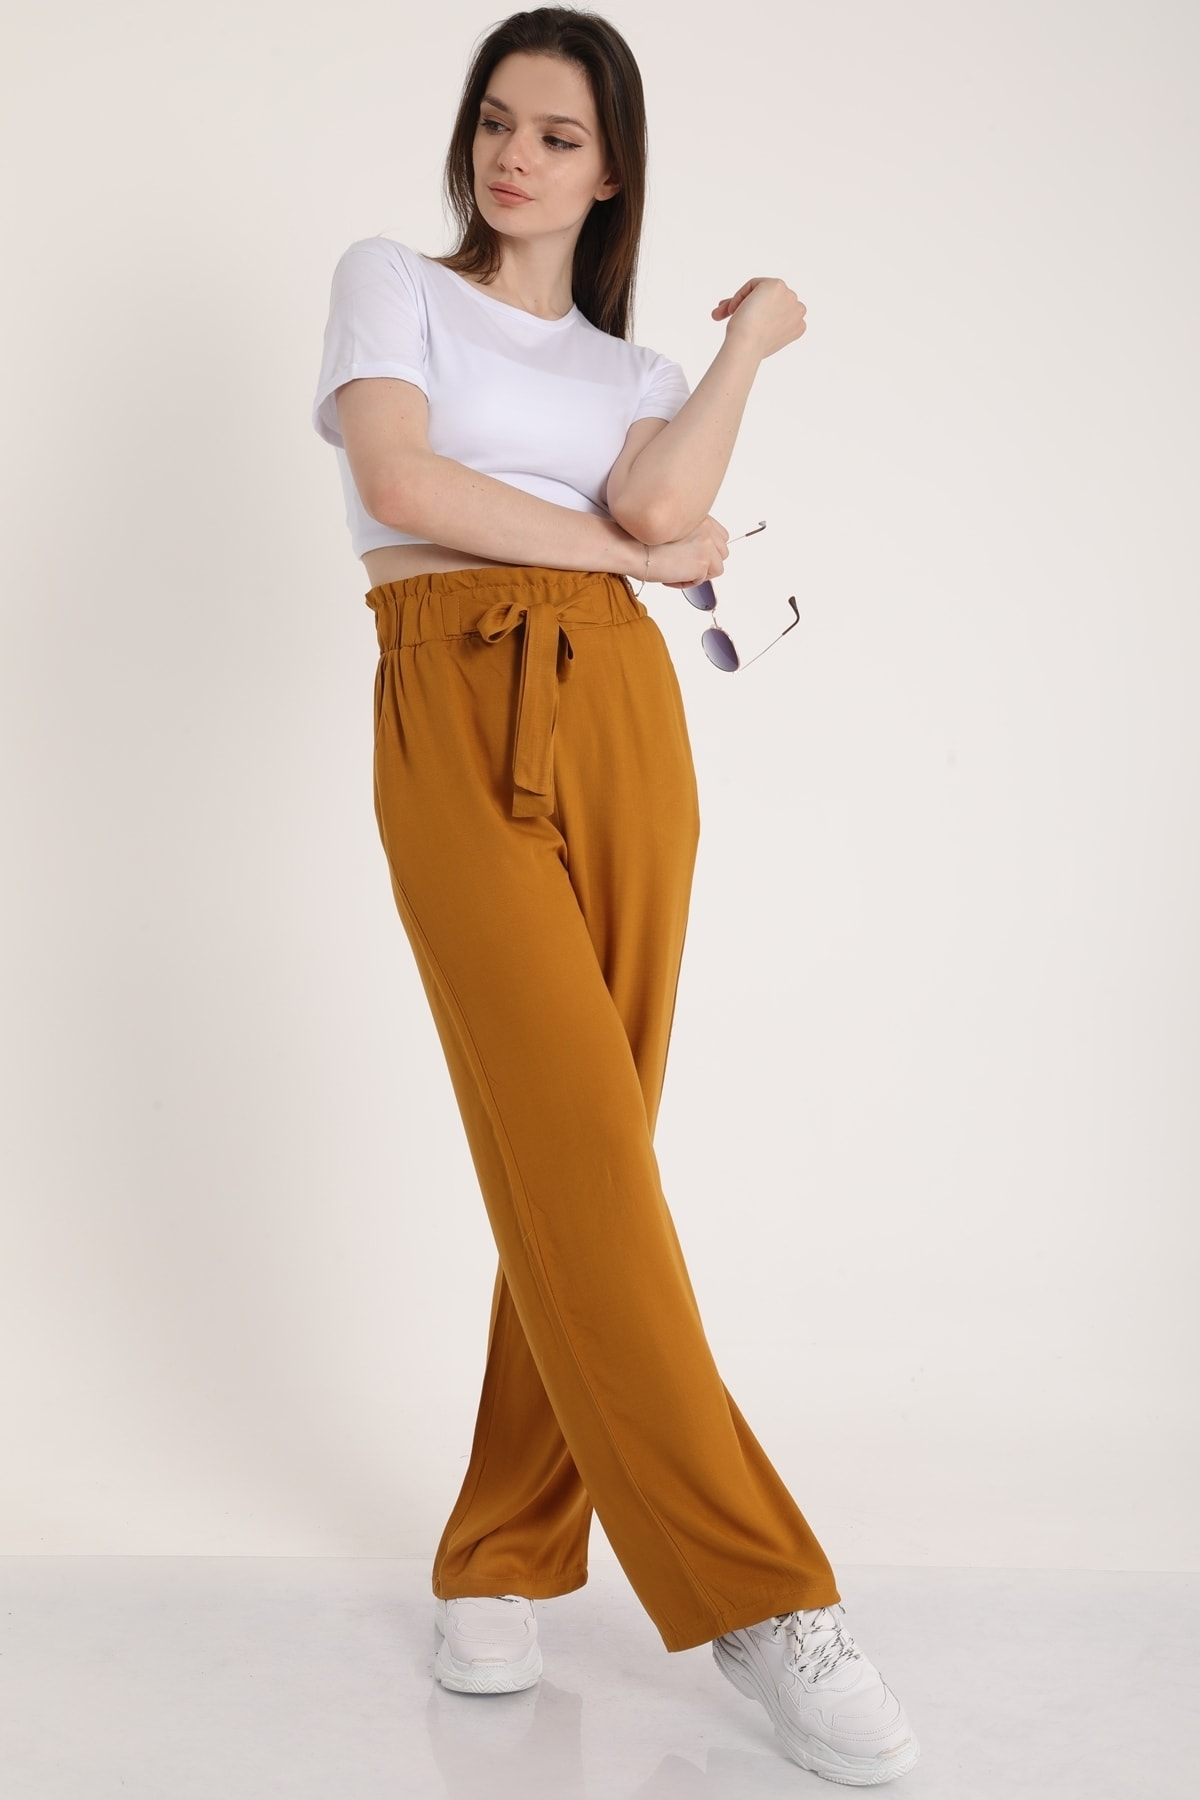 Kadın Taba Bel Lastikli Kemerli Salaş Pantolon  Mdt5181